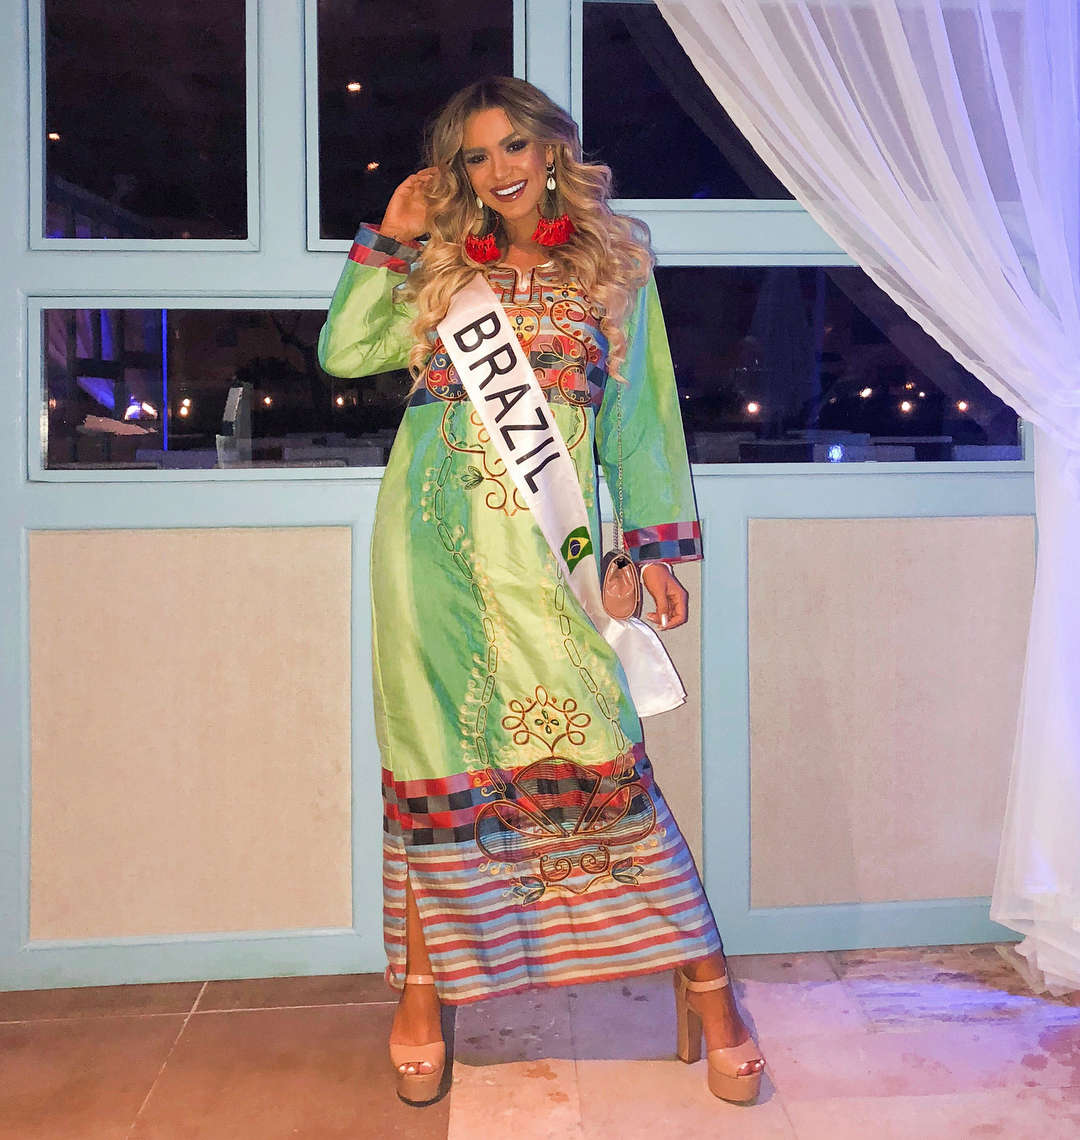 amanda cardoso, miss grand espirito santo 2019/3rd runner-up de miss intercontinental 2017. - Página 5 26071011